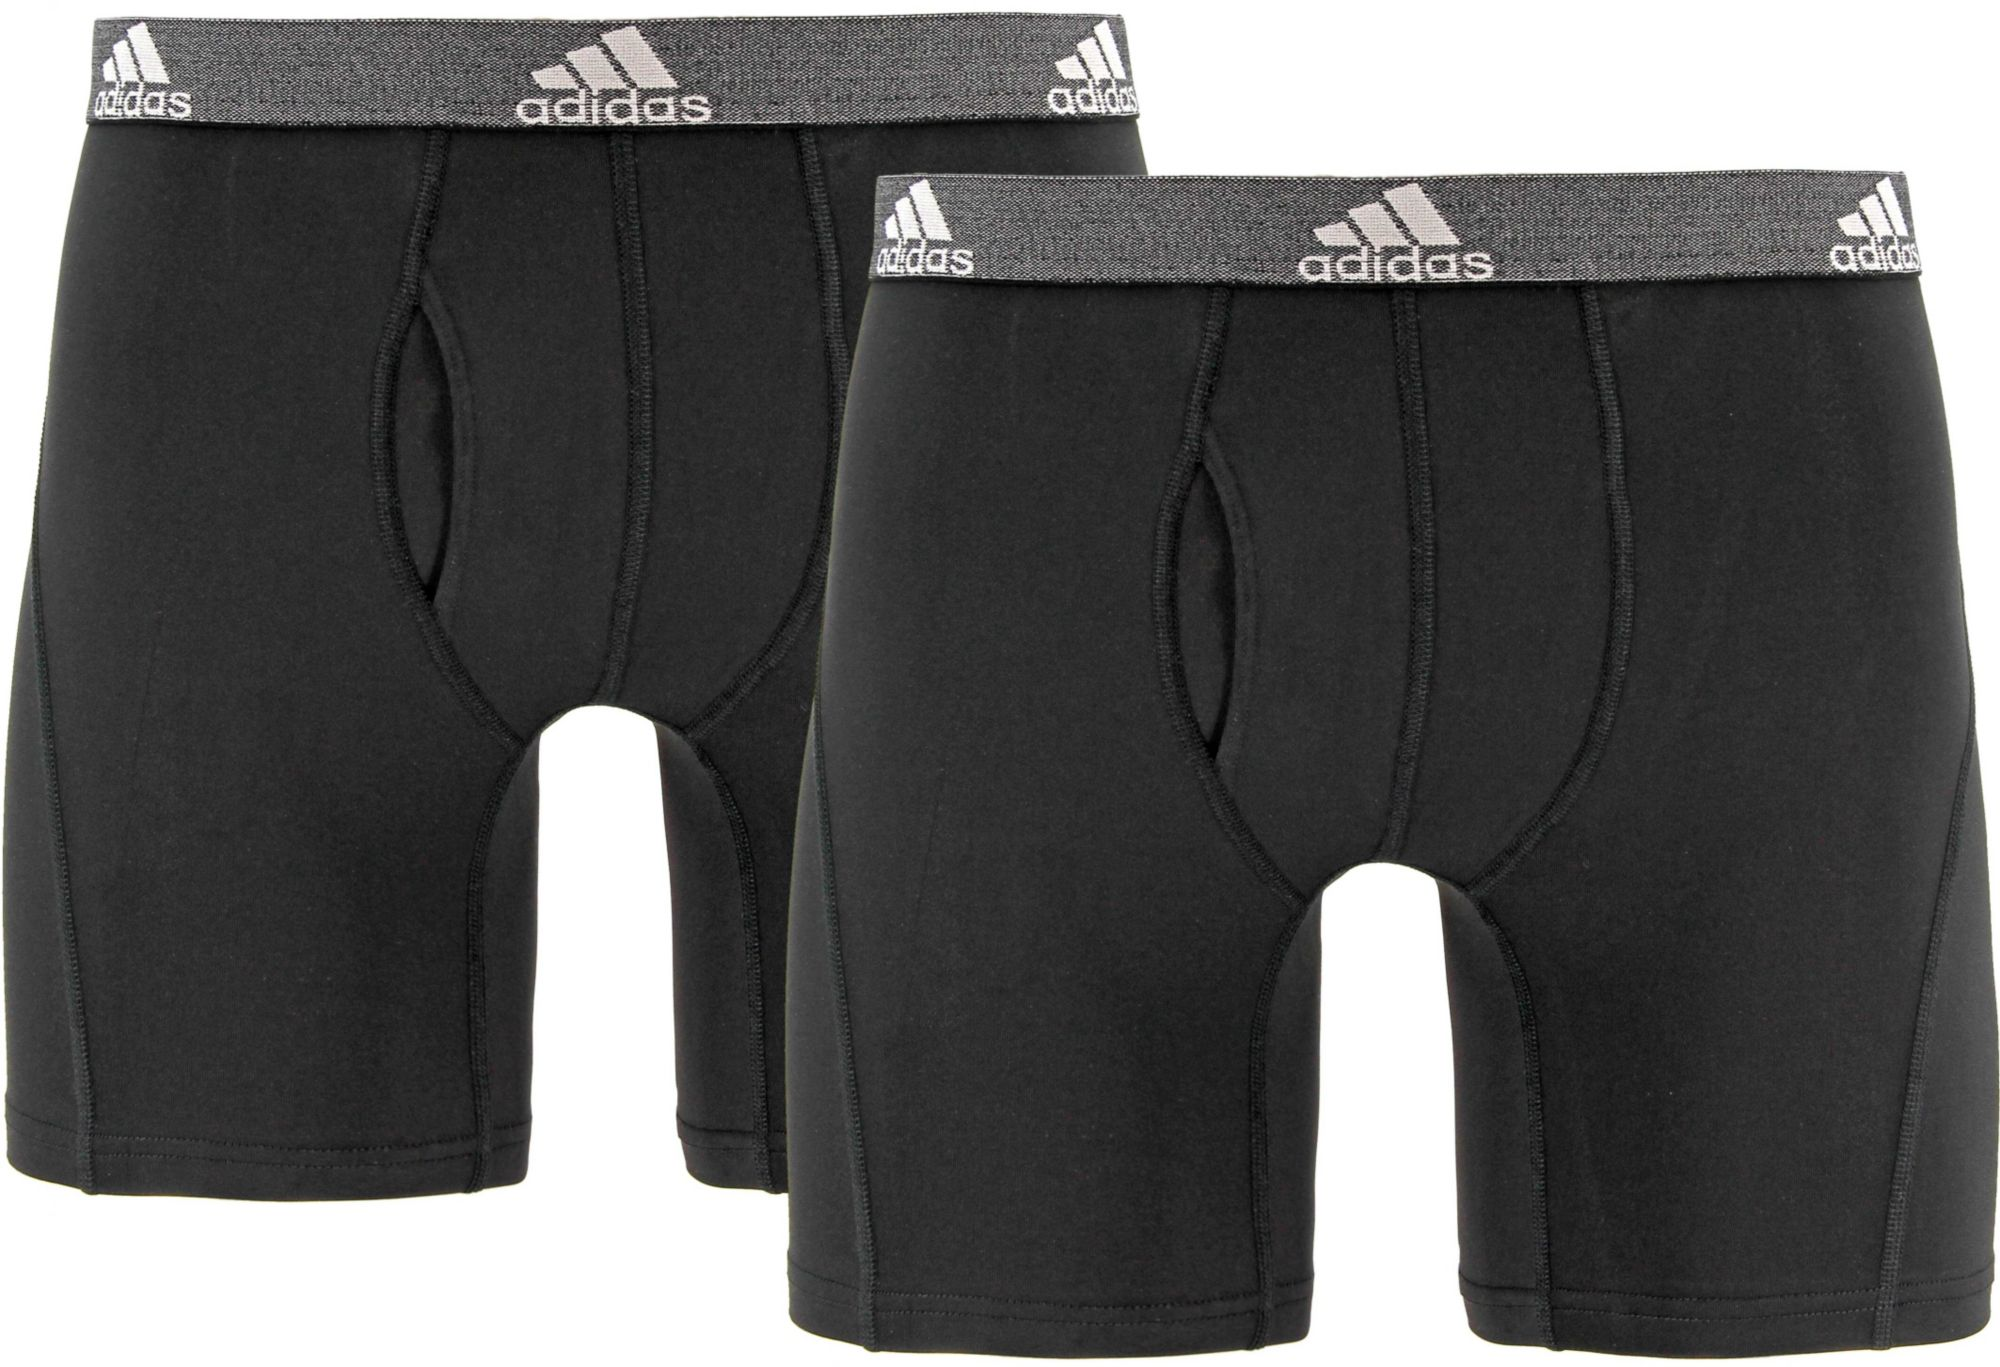 adidas boxer briefs